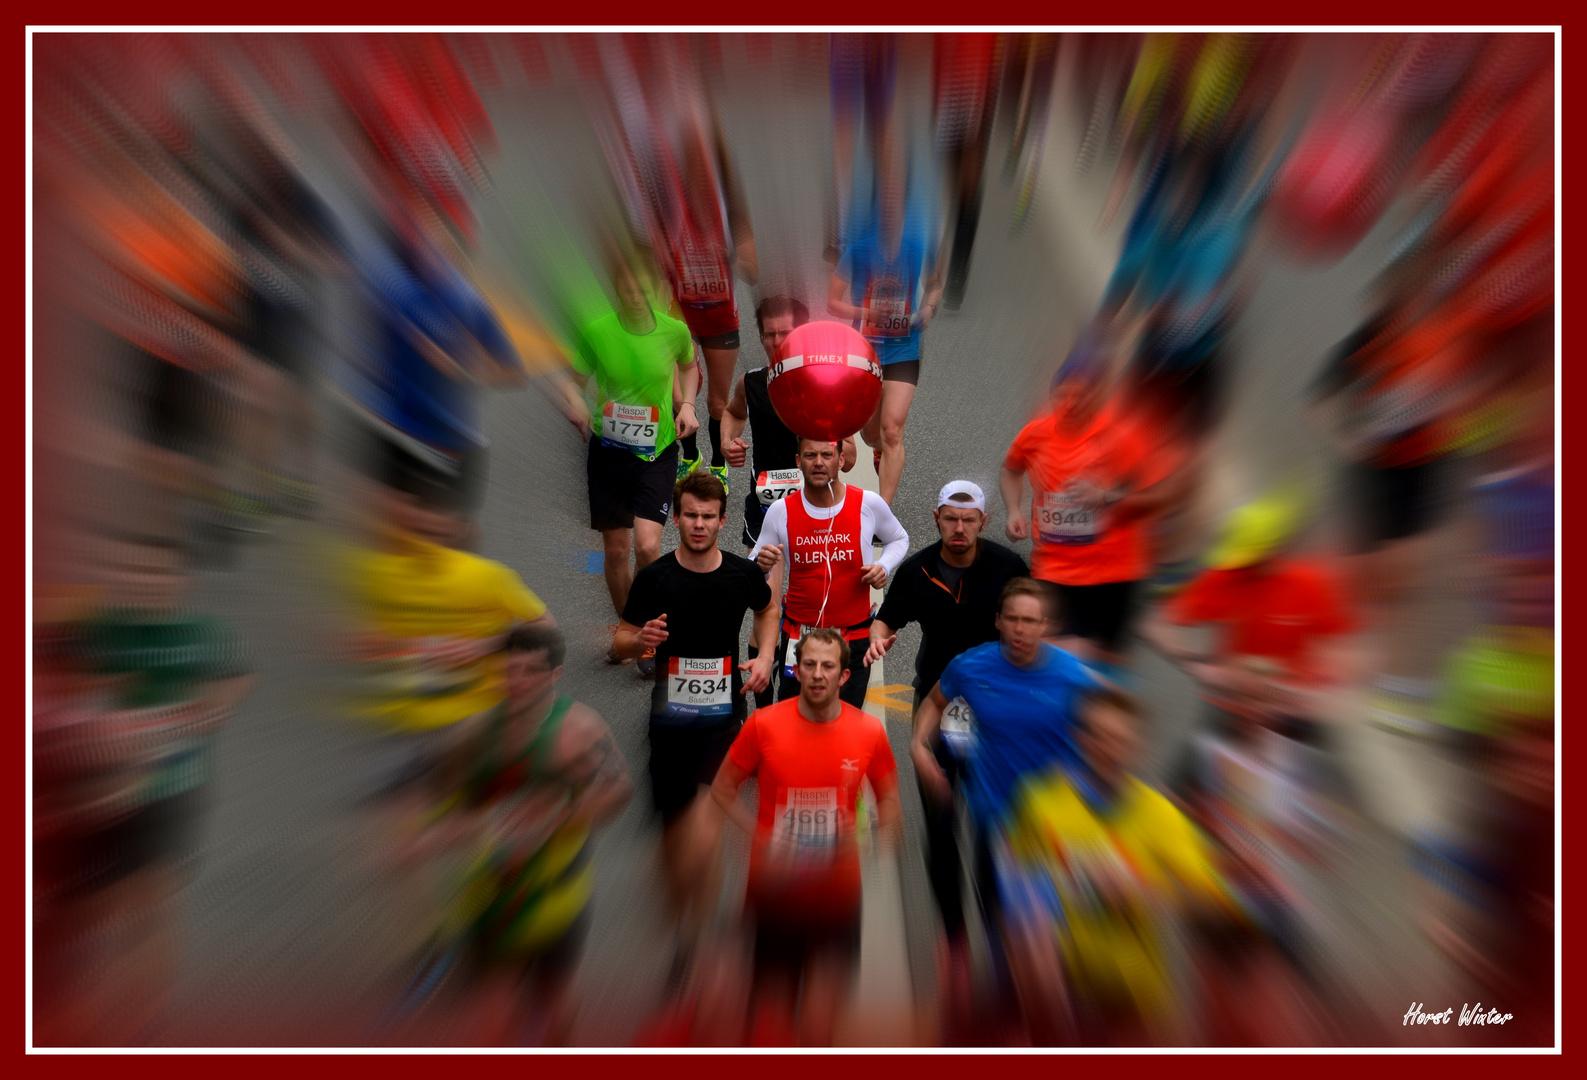 Hamburg Marathon 2014